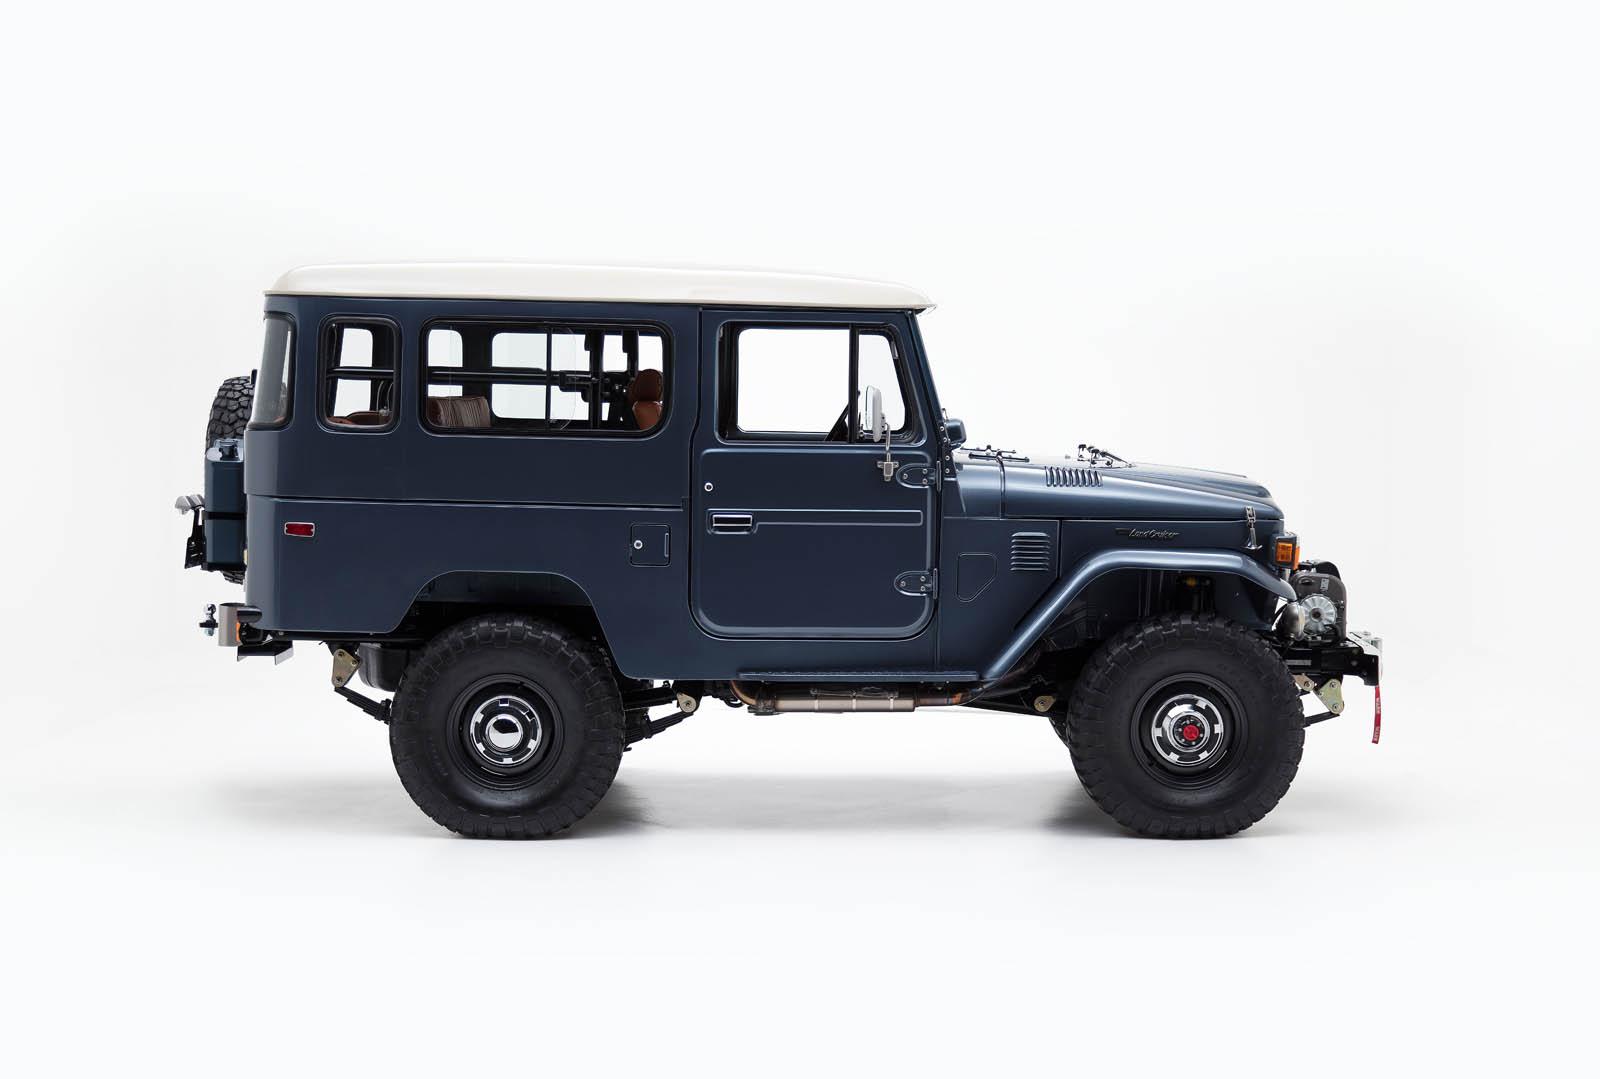 1982_Toyota_Land_Cruiser_FJ43_Aspen_Lifestyle_The_FJ_Company_18